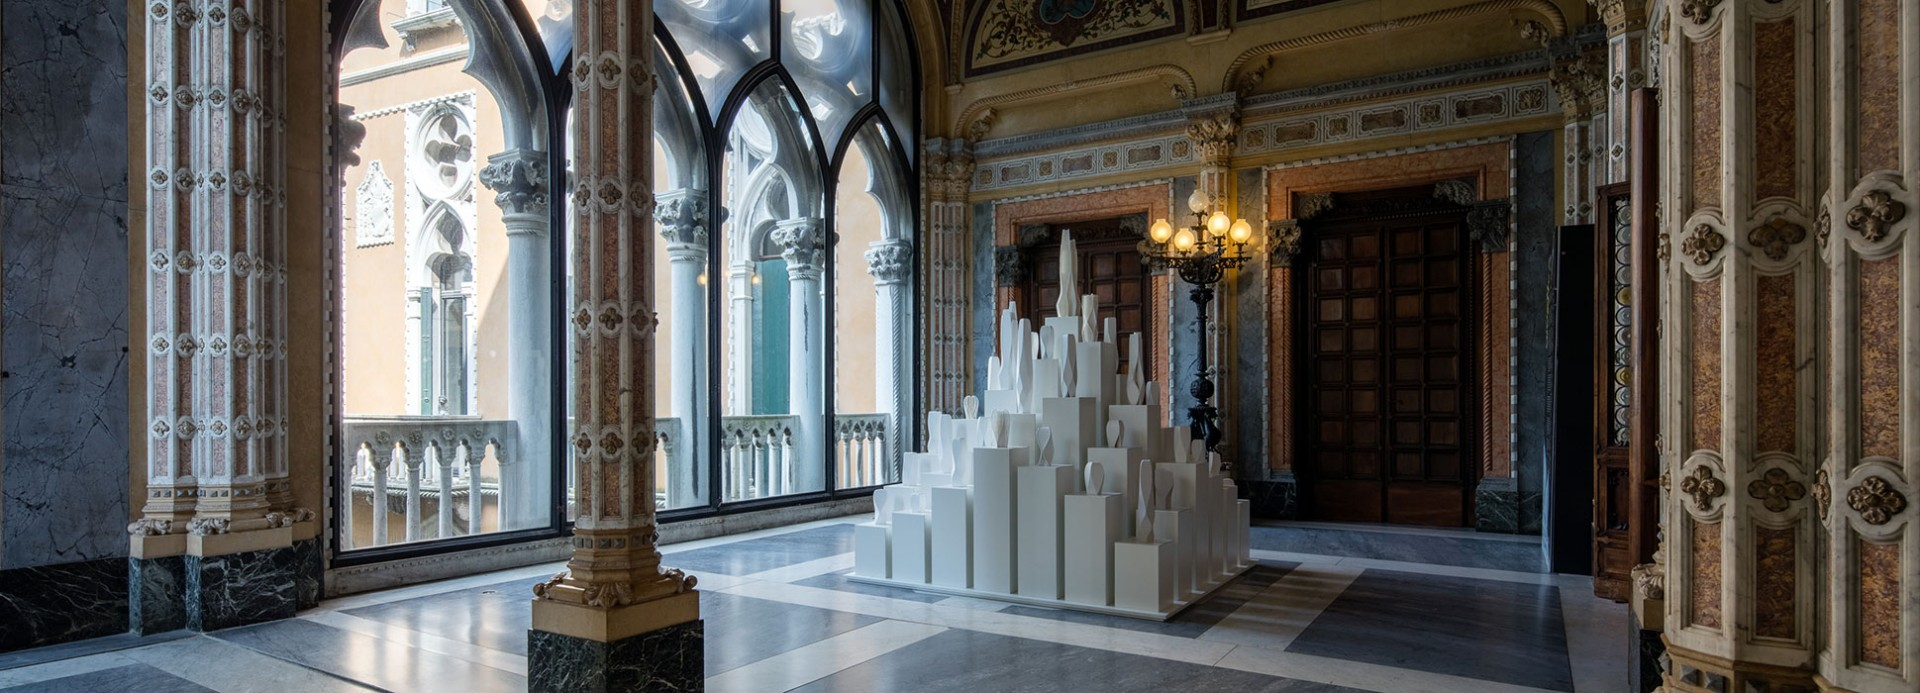 Retrospektivna izložba: Zaha Hadid, Palata Franketi, Venecija, maj – nov. 2016.